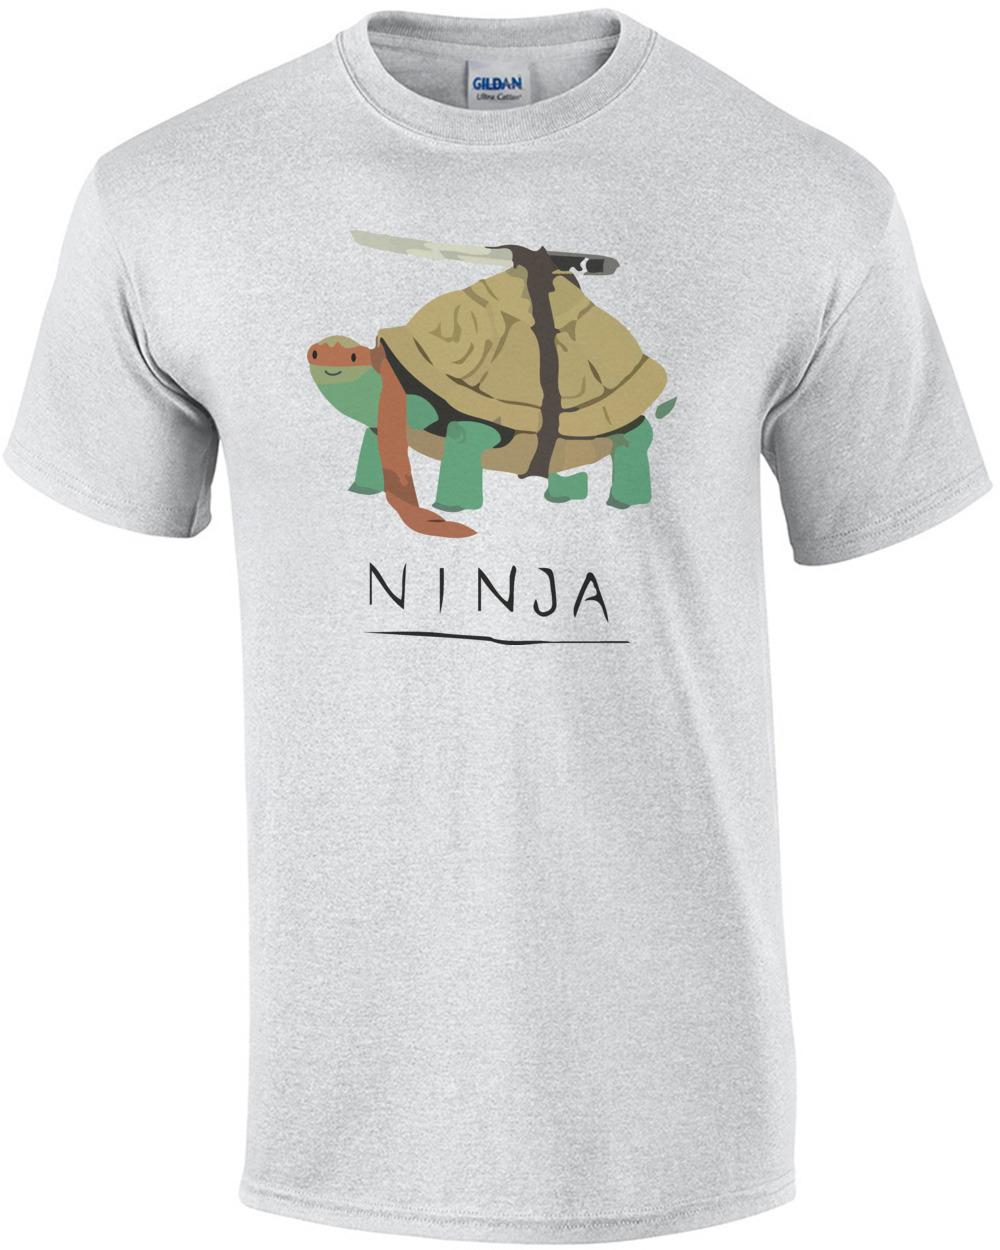 5655390f1bdfa Ninja Turtle Funny T-Shirt shirt